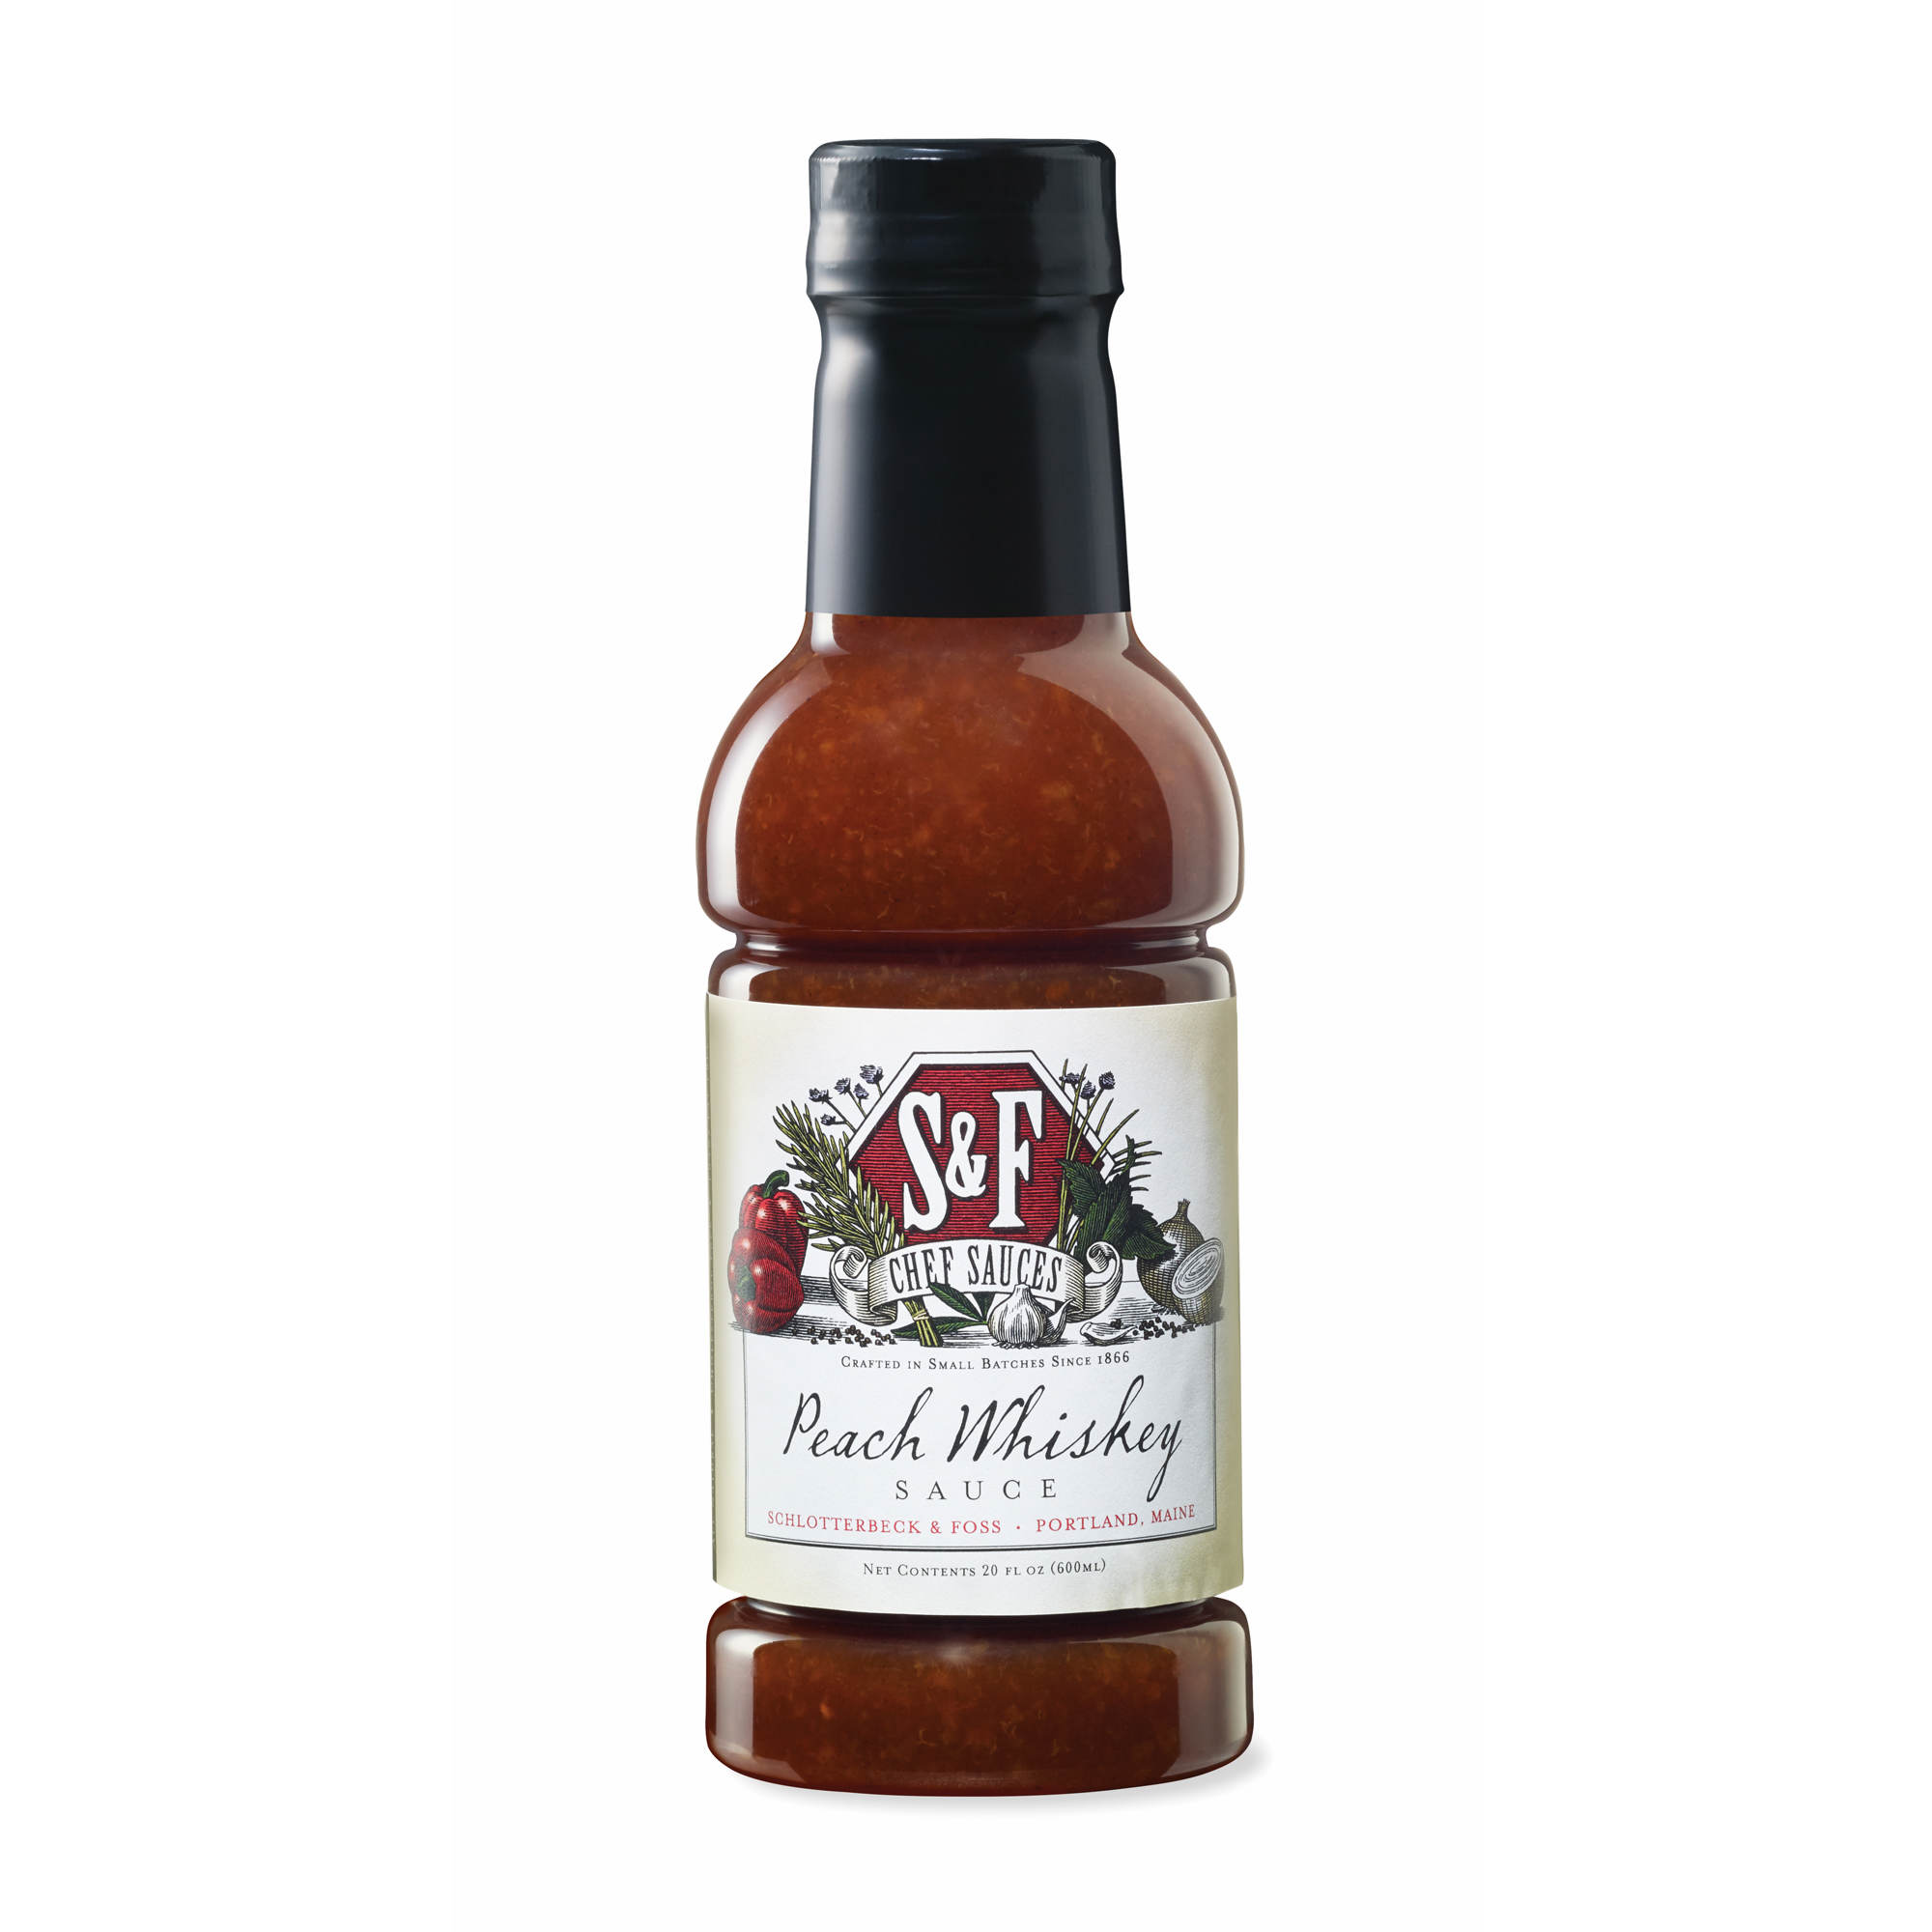 Peach Whiskey Sauce, 20 oz. - BJ's Wholesale Club